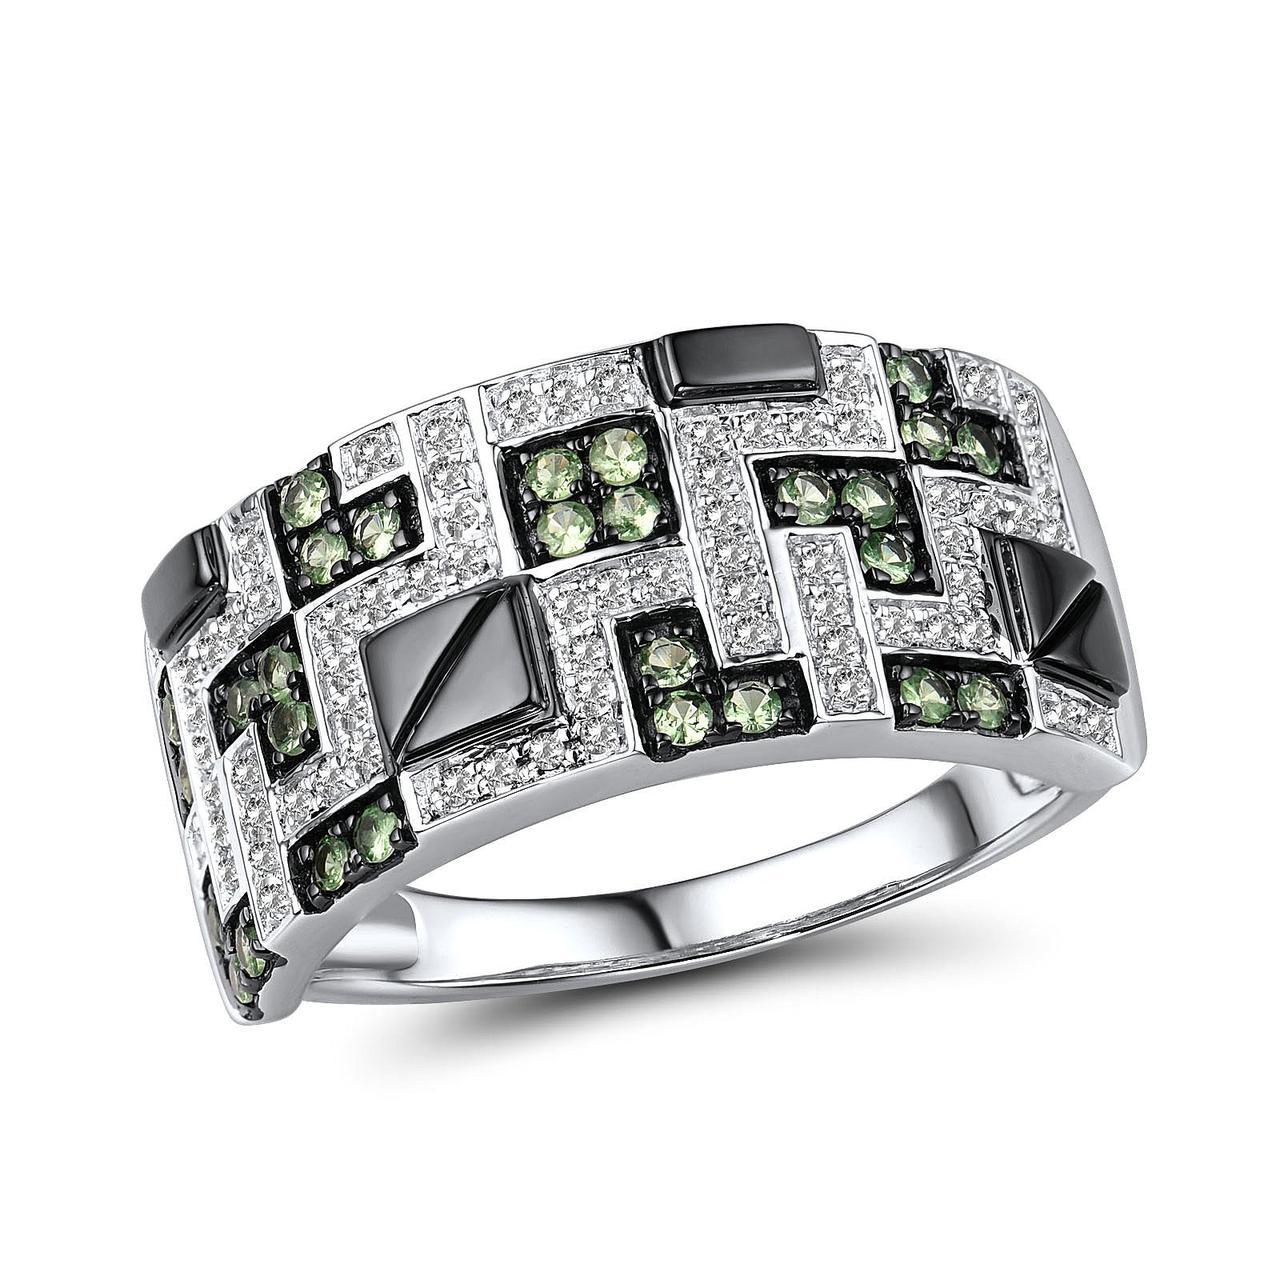 Золотое кольцо с бриллиантами и гранатами, размер 17 (1719065)